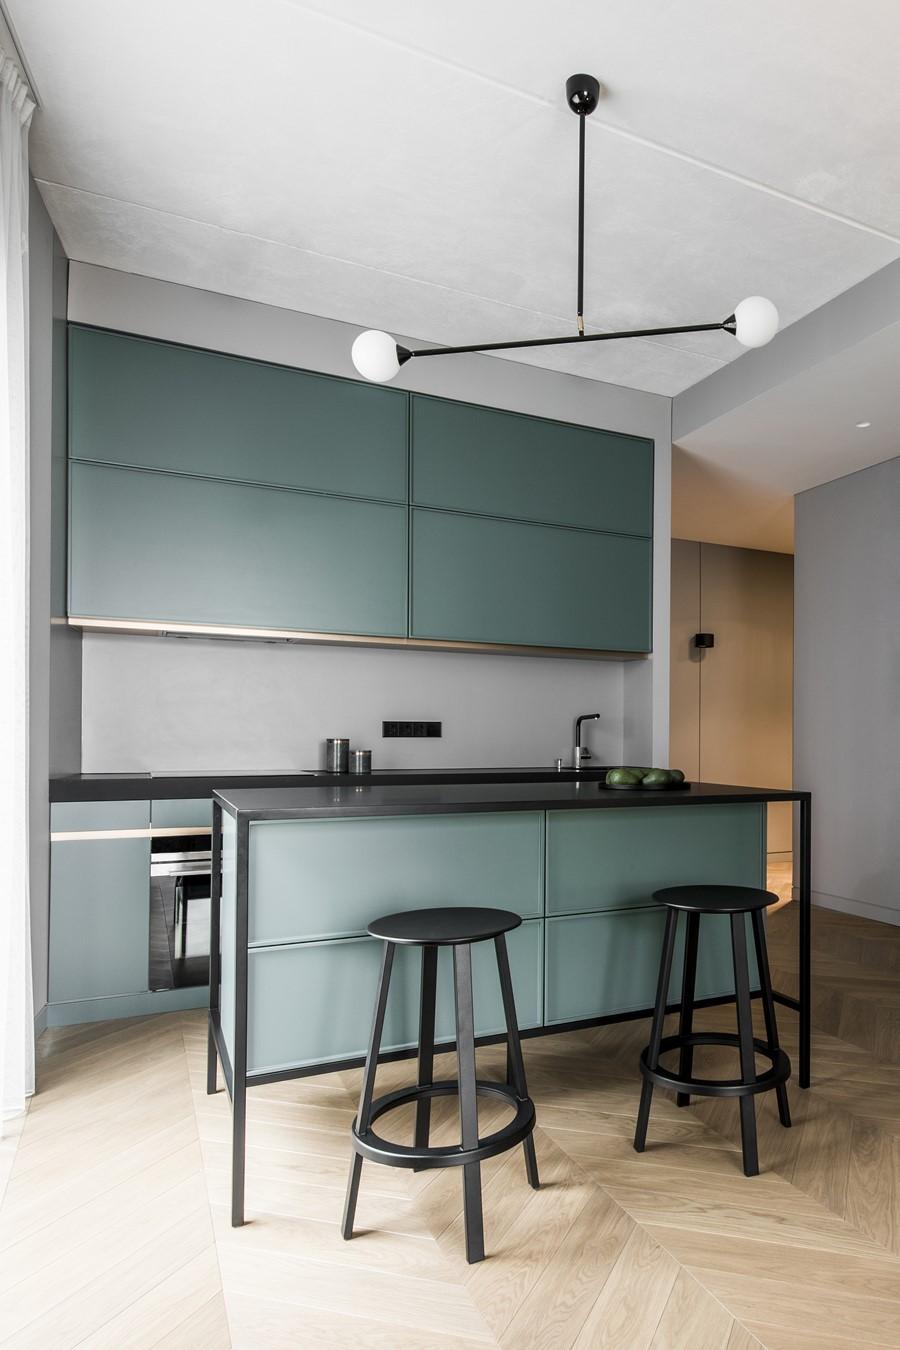 interior-design-by-normundas-vilkas-02